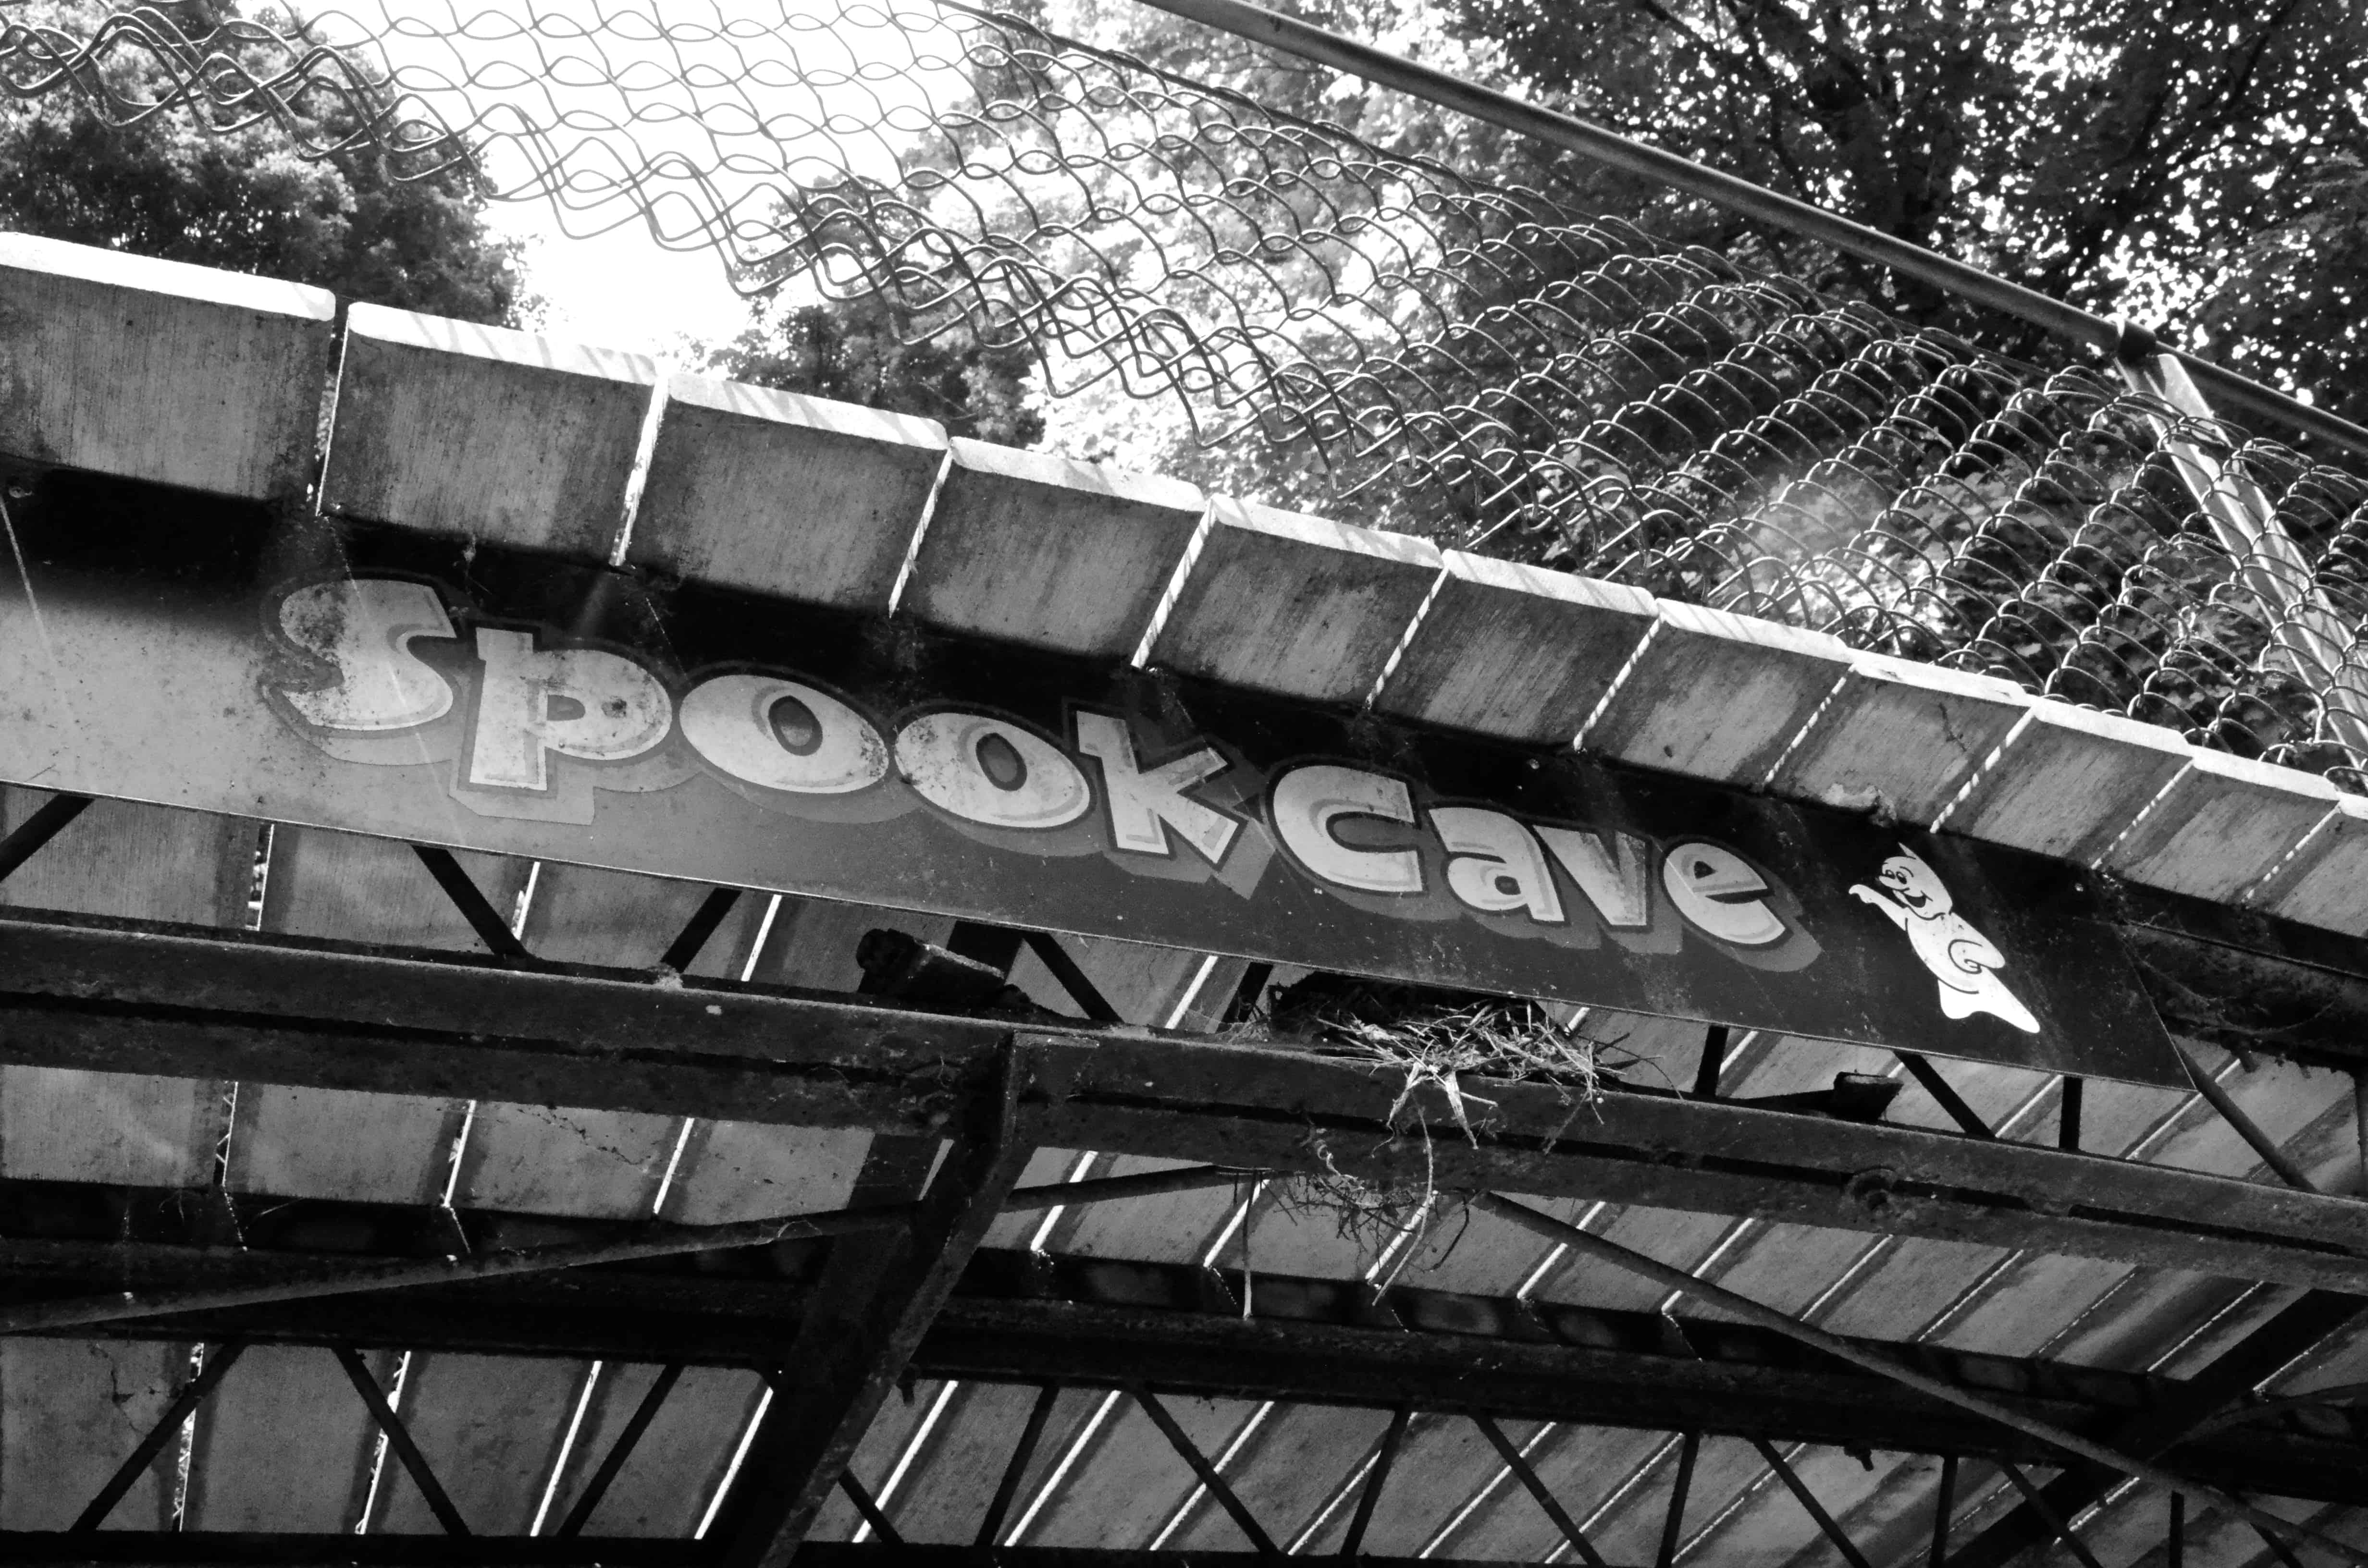 Spook Cave & Campground in MacGregor Iowa